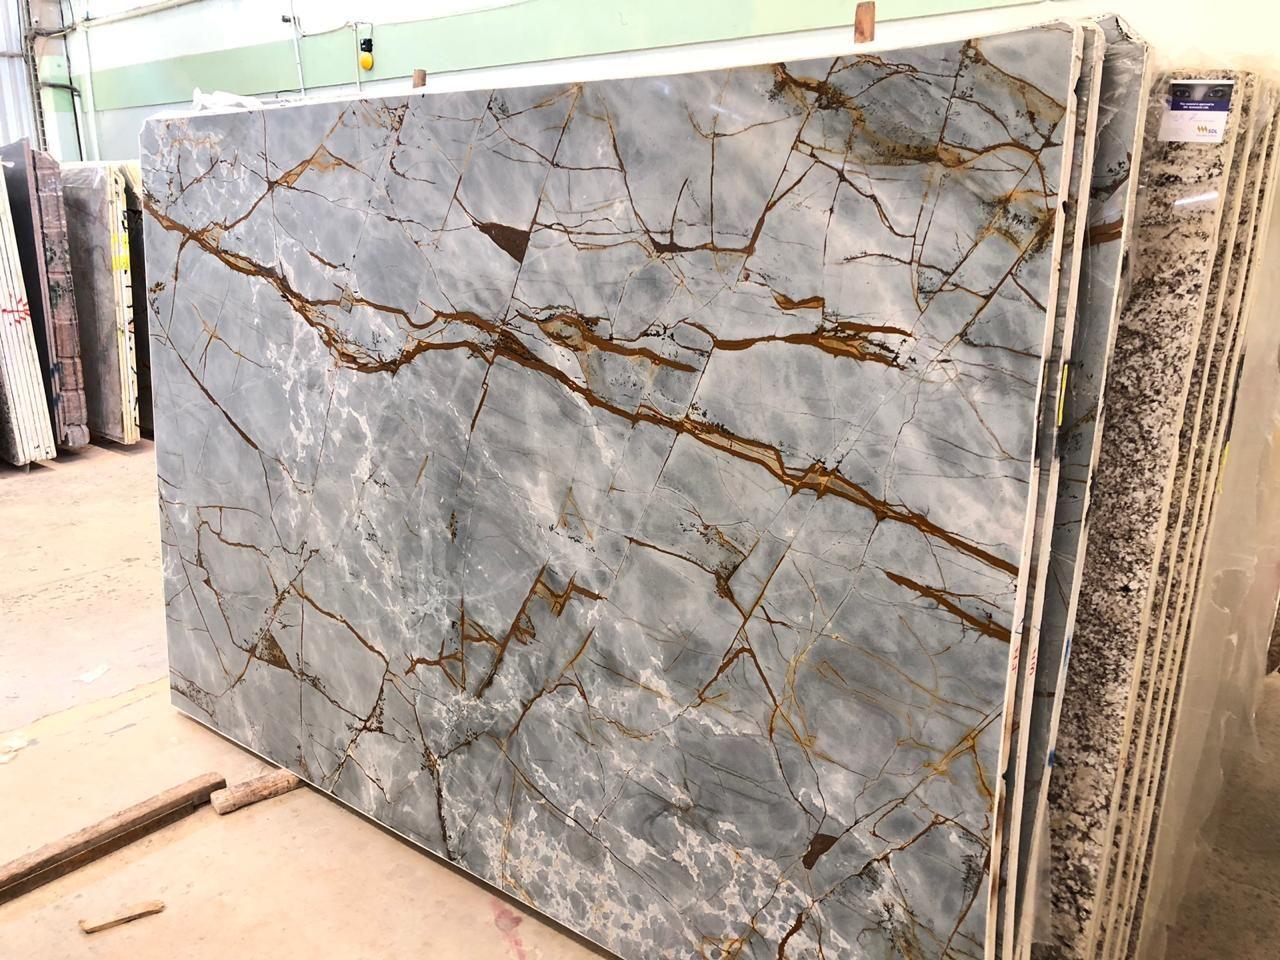 Blue Roma Slabs Marble Trend Marble Granite Tiles Toronto Ontario Marble Trend Marble Granite Tiles Toro Marble Trend Granite Toronto Ontario